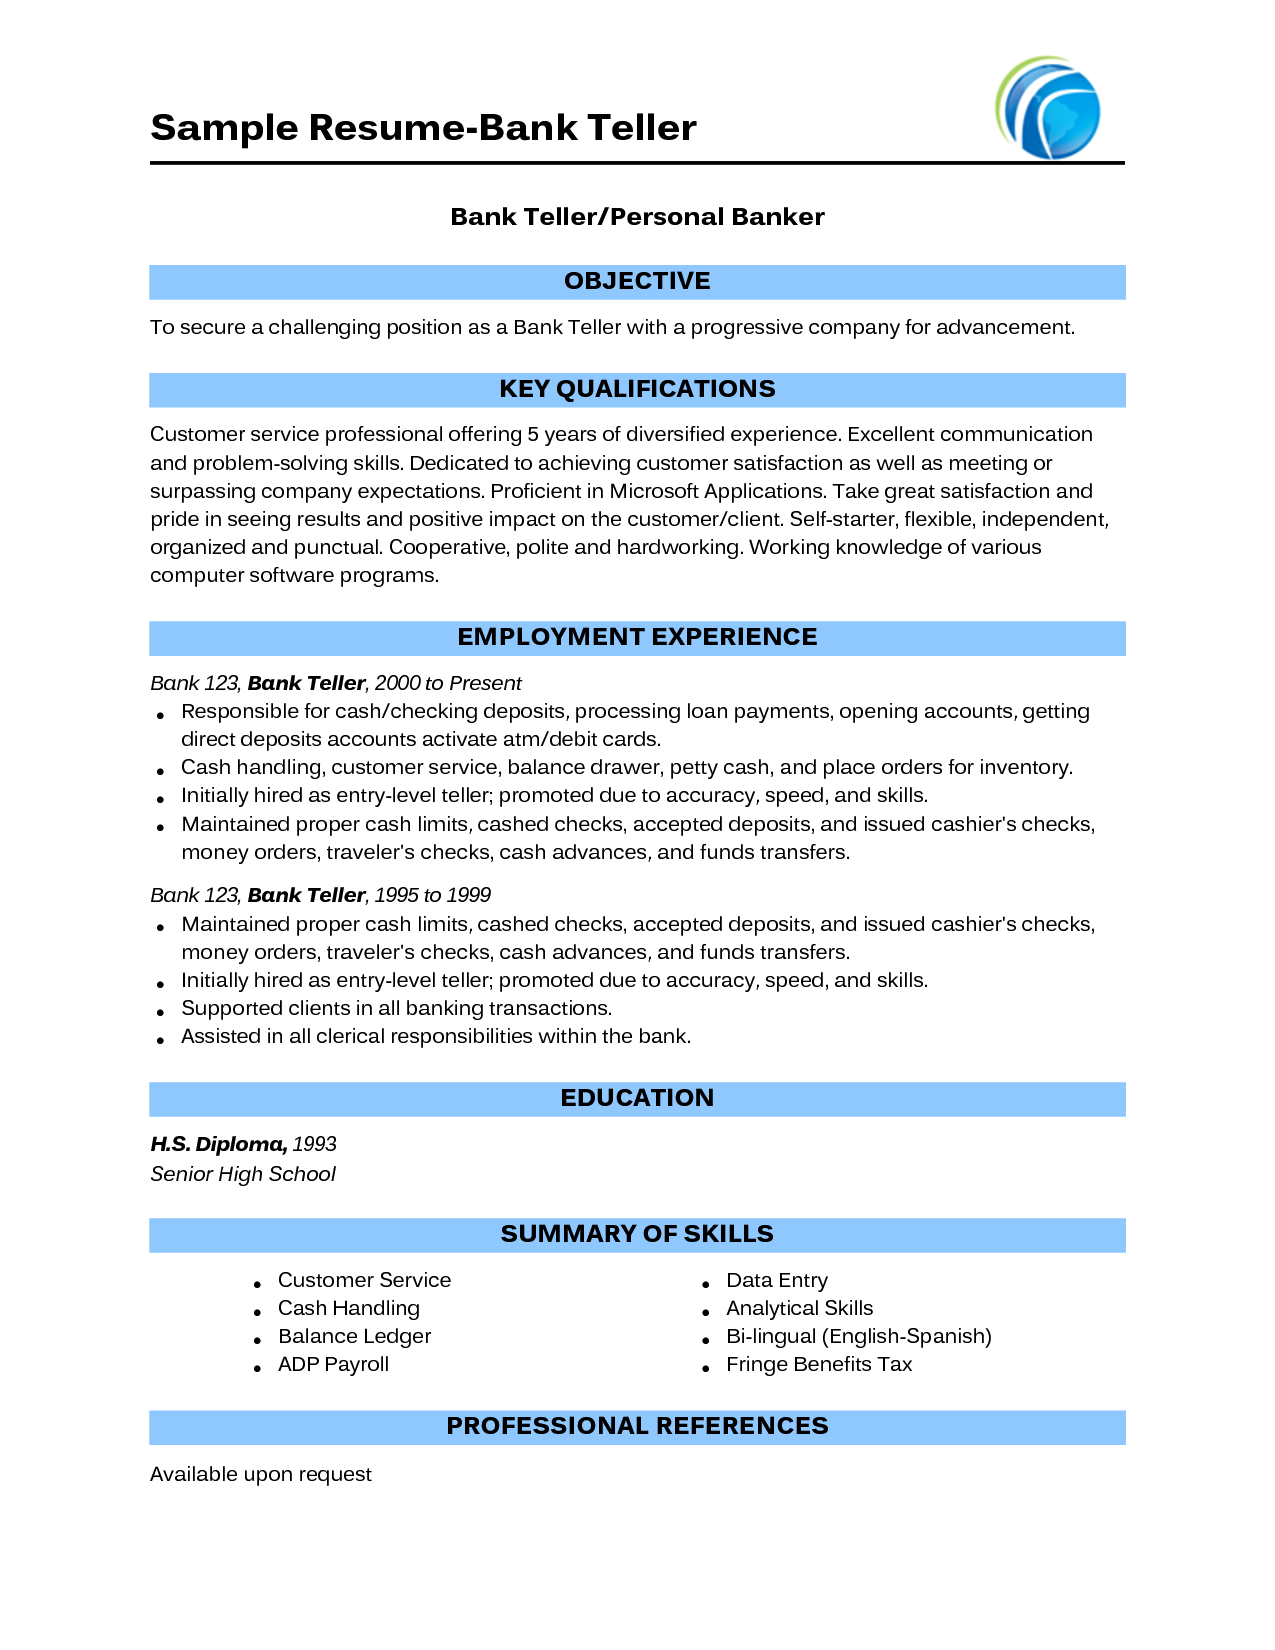 Sample Bank Teller Resume No Experiences Bank Teller Resume Resume No Experience Online Resume